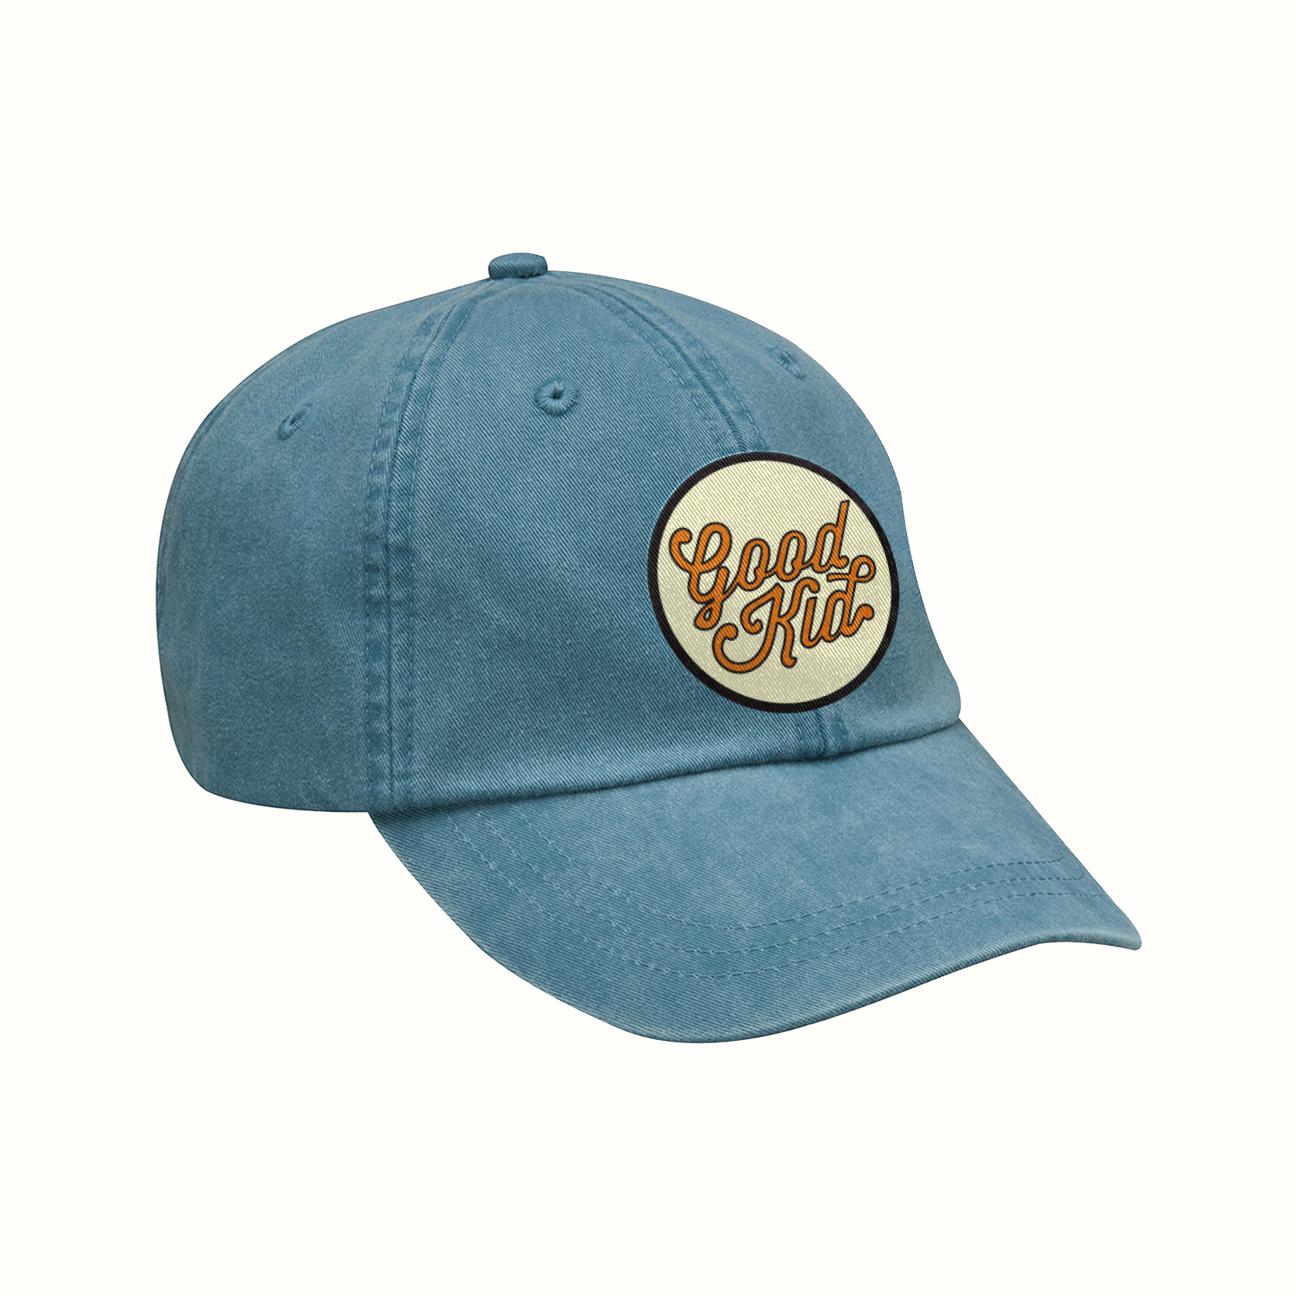 Good Kid Dad Hat